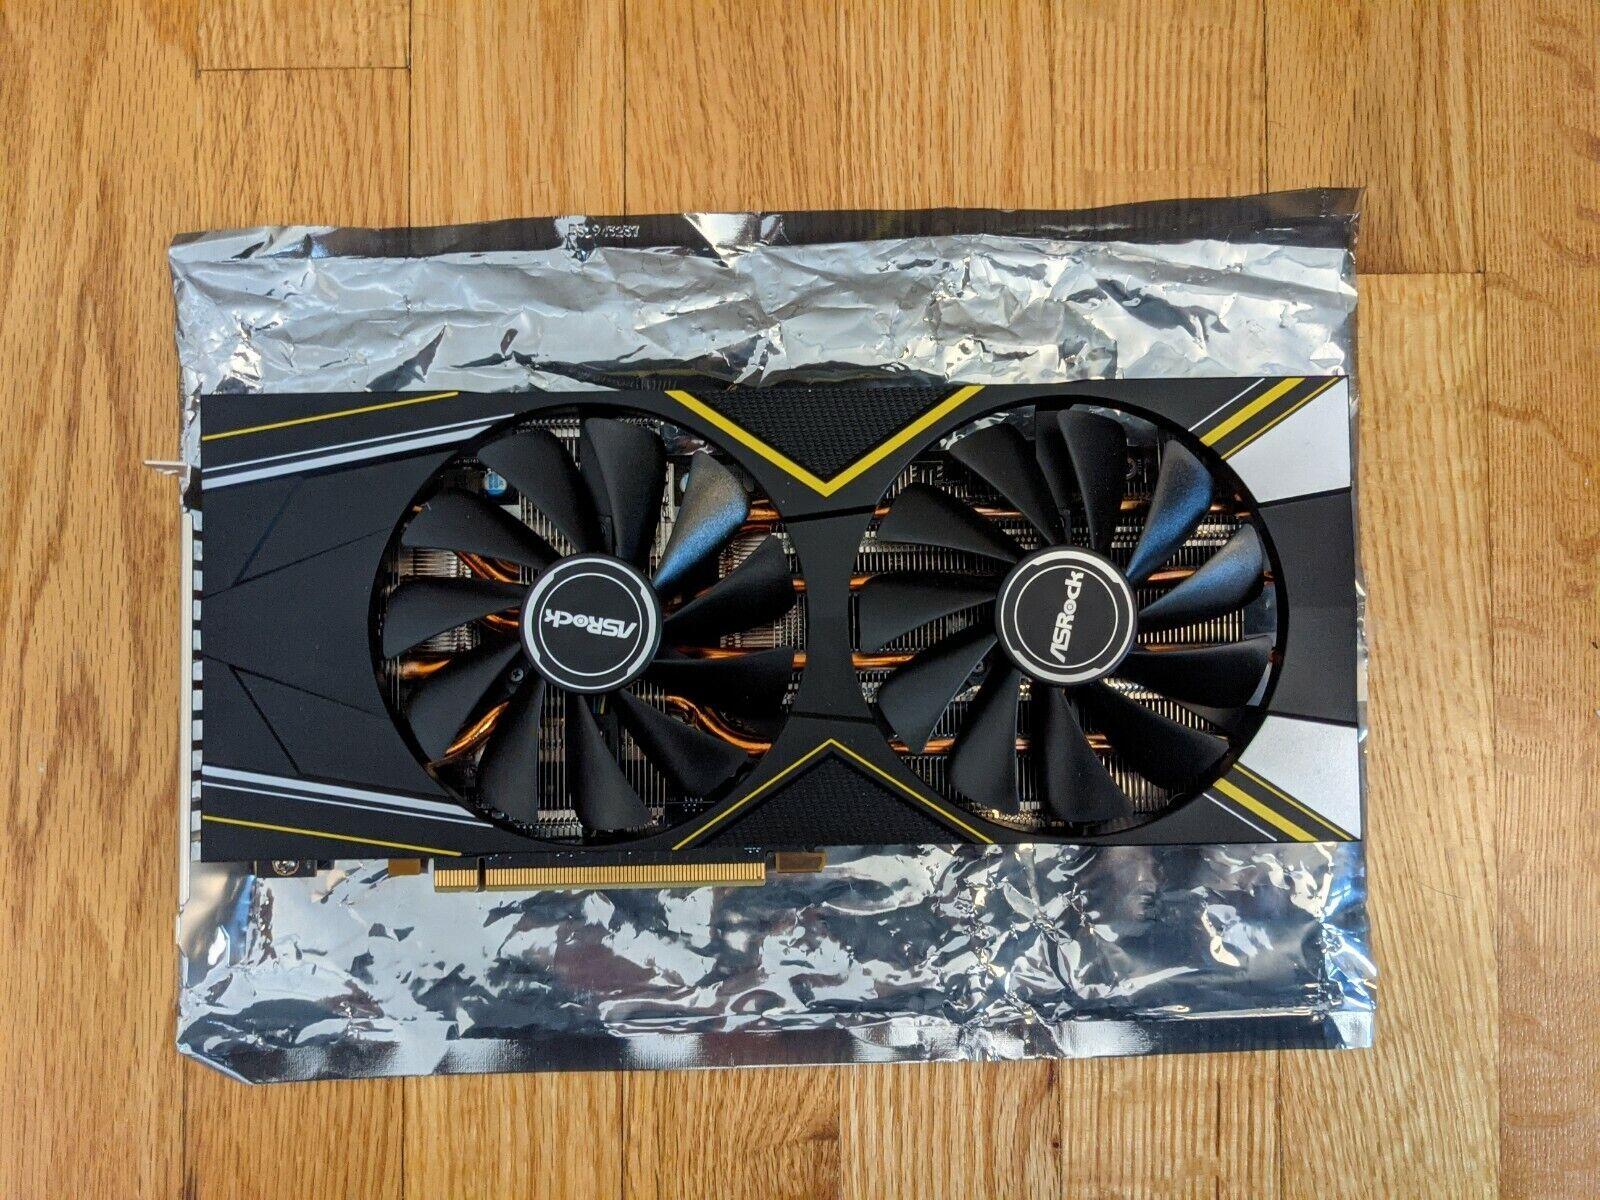 ASRock AMD RX 5700XT Challenger D OC 8GB Graphics Card GPU